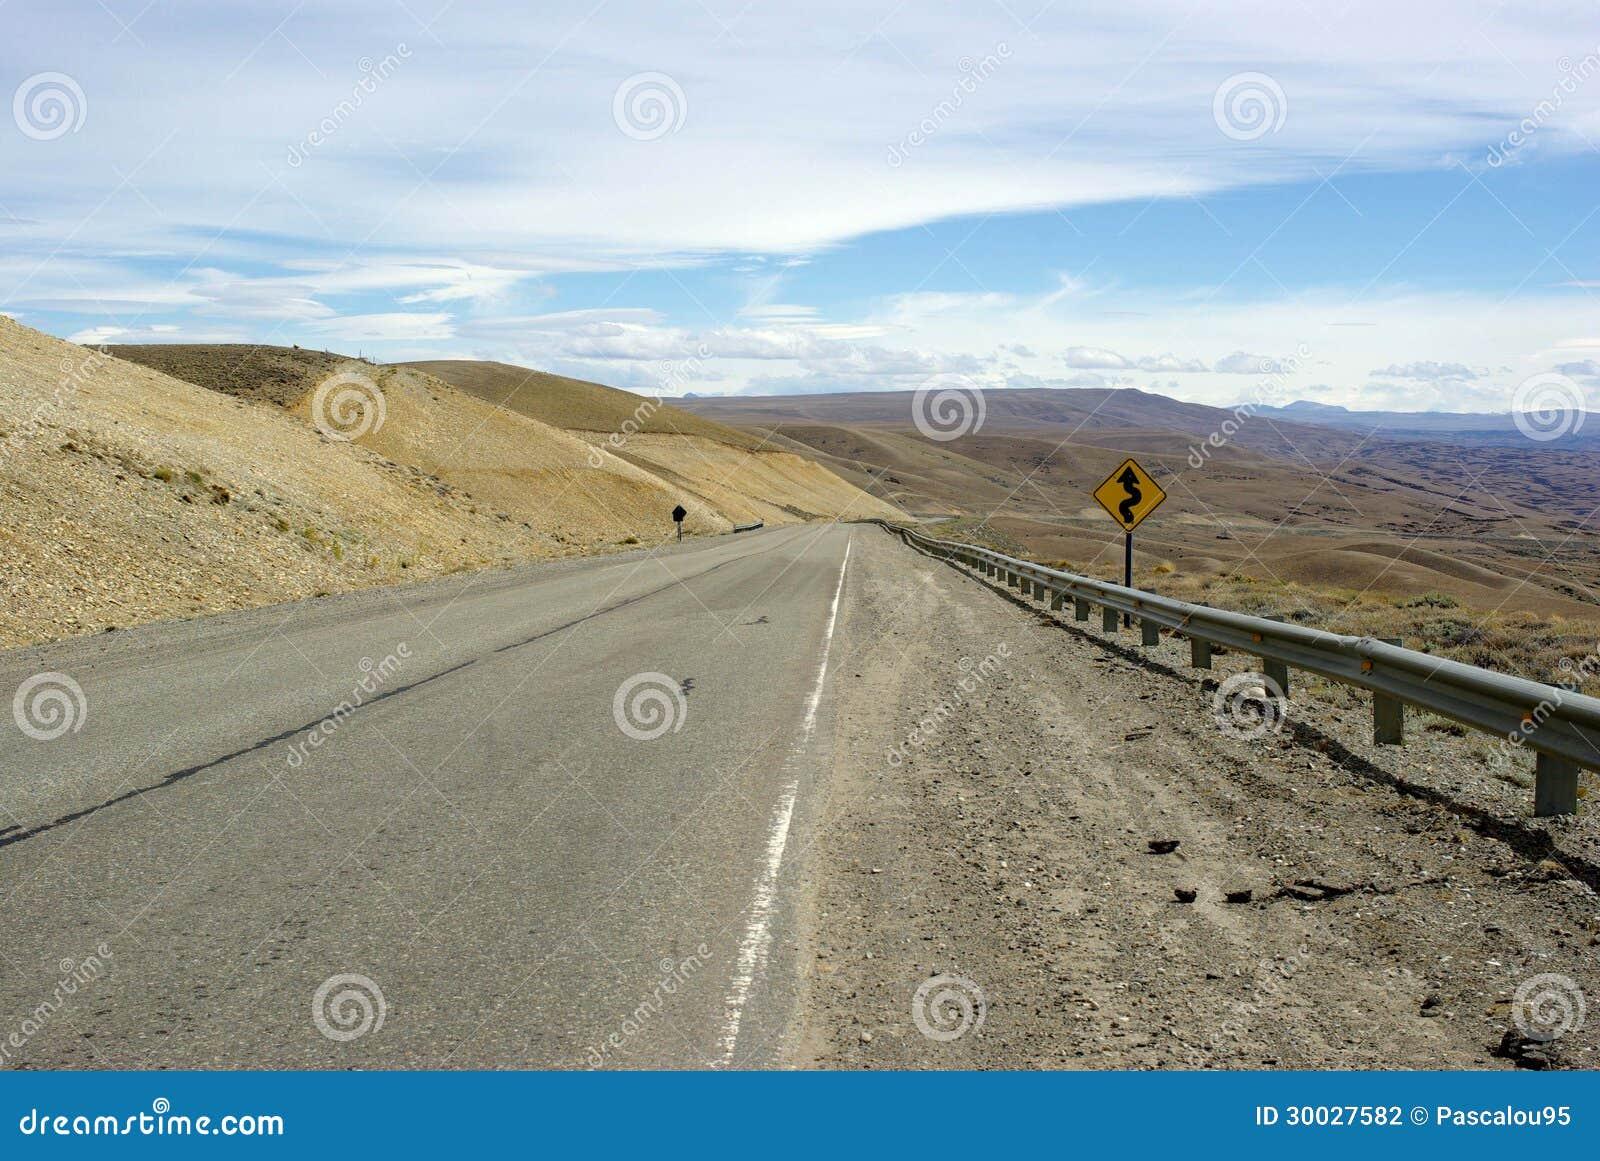 Road In Argentina Stock Photo Image Of Patagonia Symbol 30027582